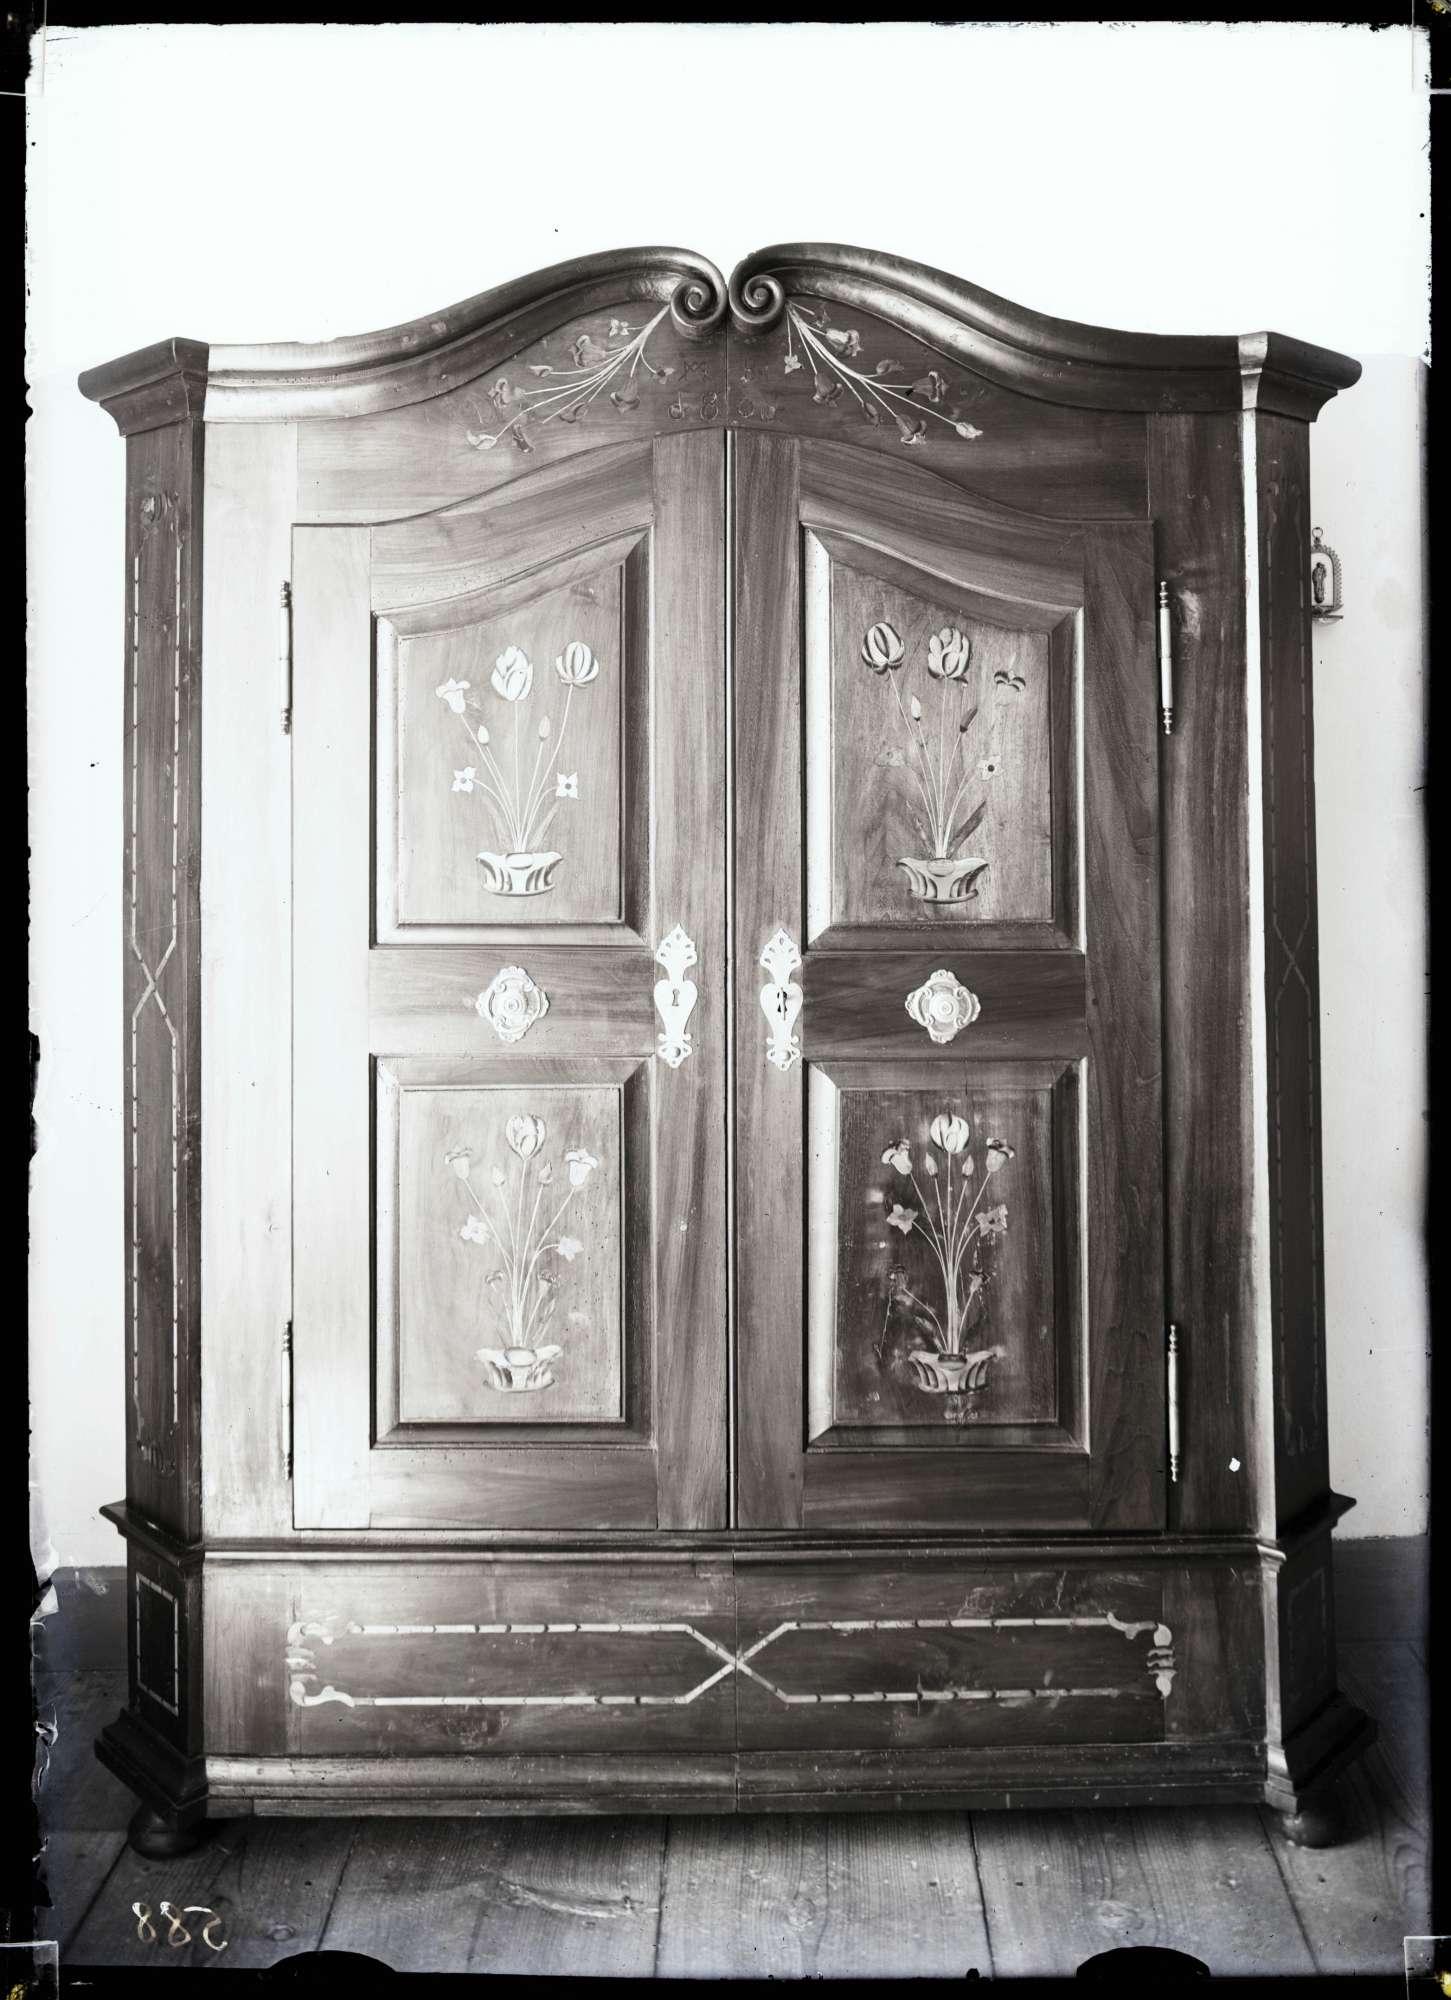 Schrank 1808 im Pfarrhaus, Bild 1